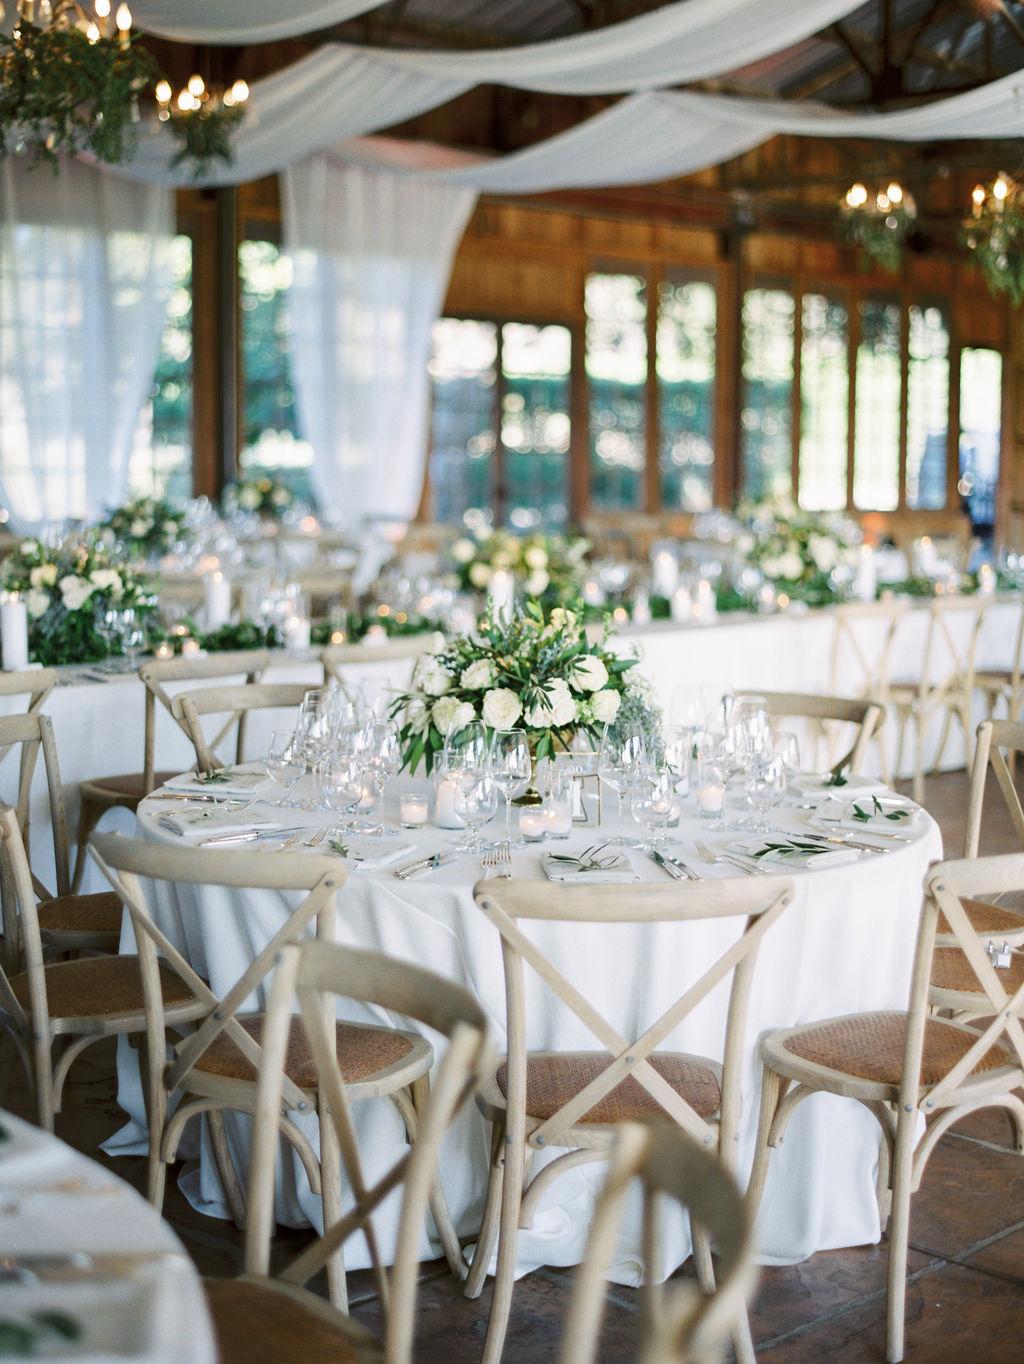 alegria-by-design-wedding-planner-planning-event-design-coordinator-day-of-month-crossroads-estate-garden-vineyard-firestone-barn-location-rustic-santa-barbara (1 (15).JPG